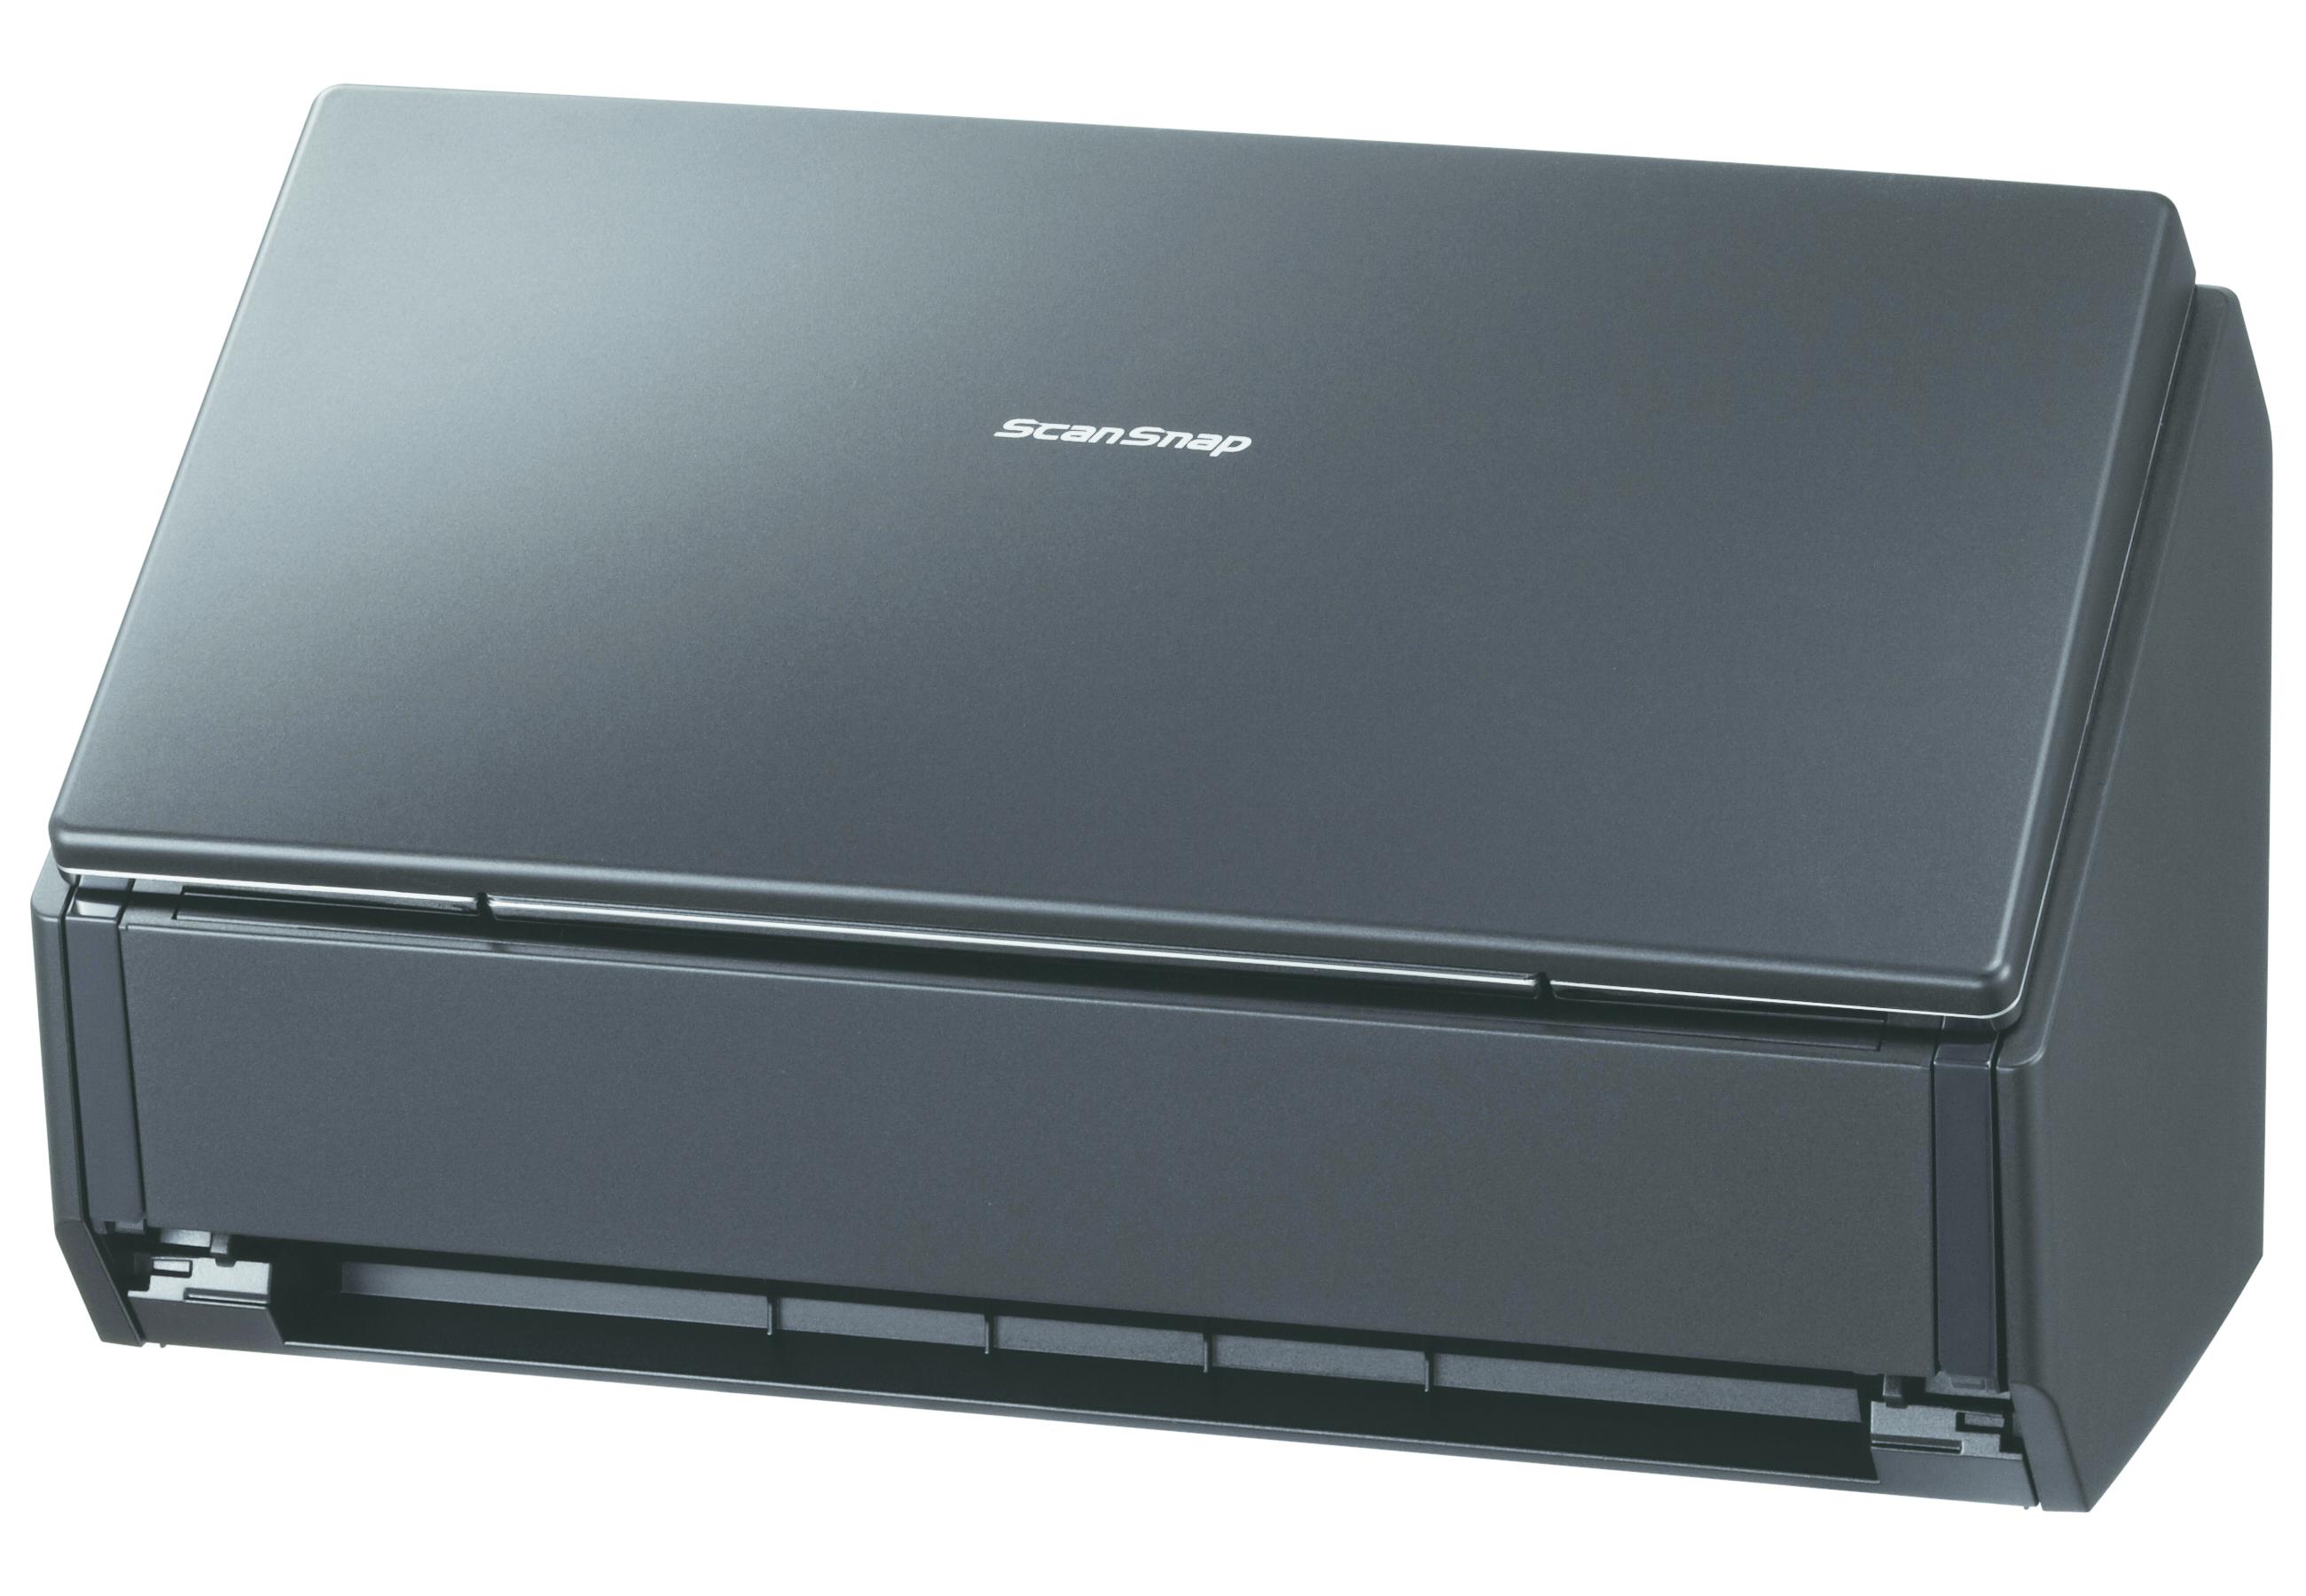 FUJITSU ScanSnap iX500 Scanner A4 color USB3.0 ADF duplex 25ppm + WiFi Win und Mac  Acrobat DC